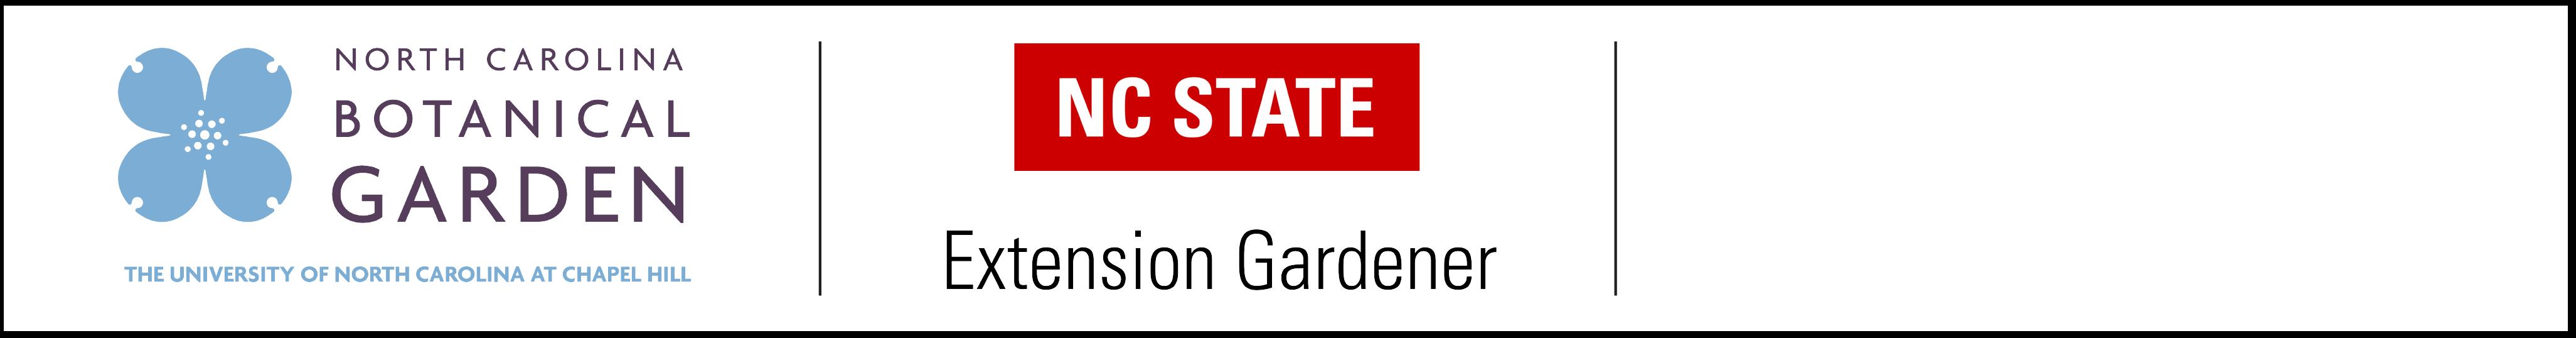 ncbg logo and nc state extension gardener logo